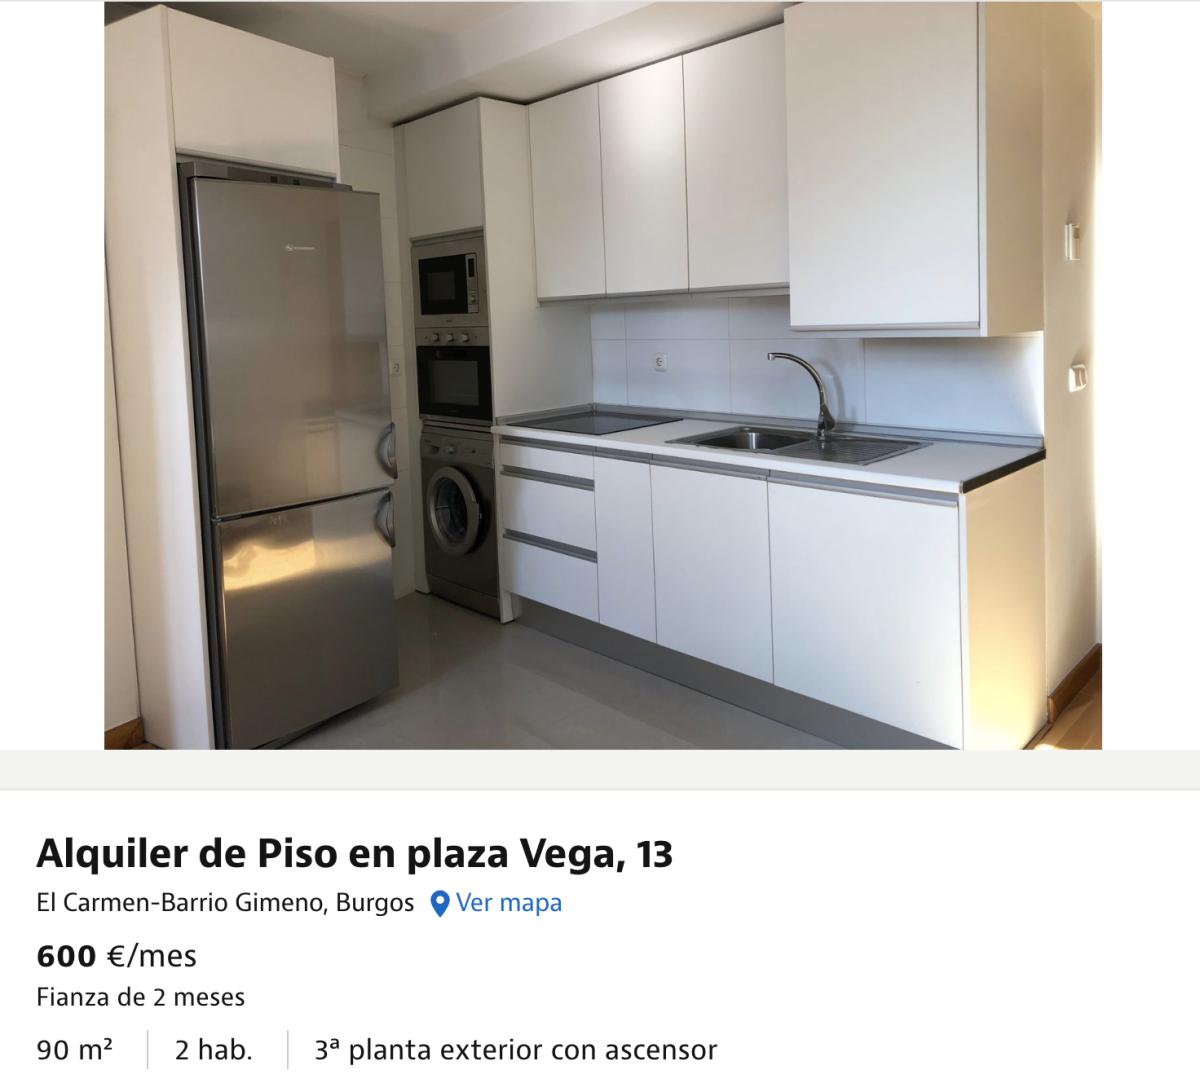 Pisos Por 600 Euros Al Mes De Alquiler En 20 Ciudades De Toda Espana